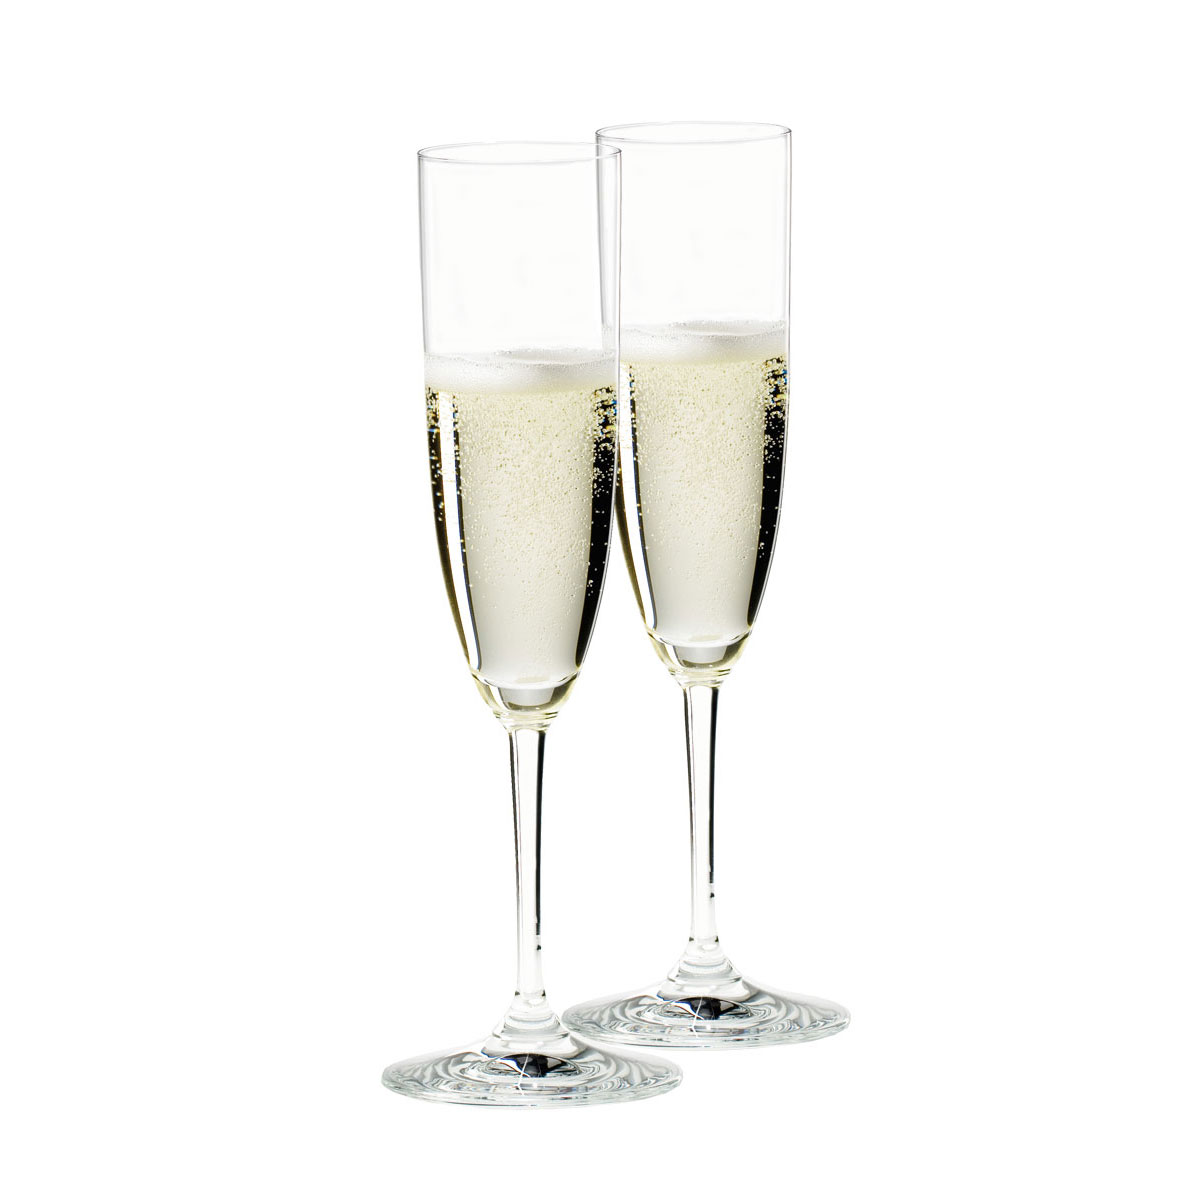 Riedel Vinum, Champagne Glasses, Pair